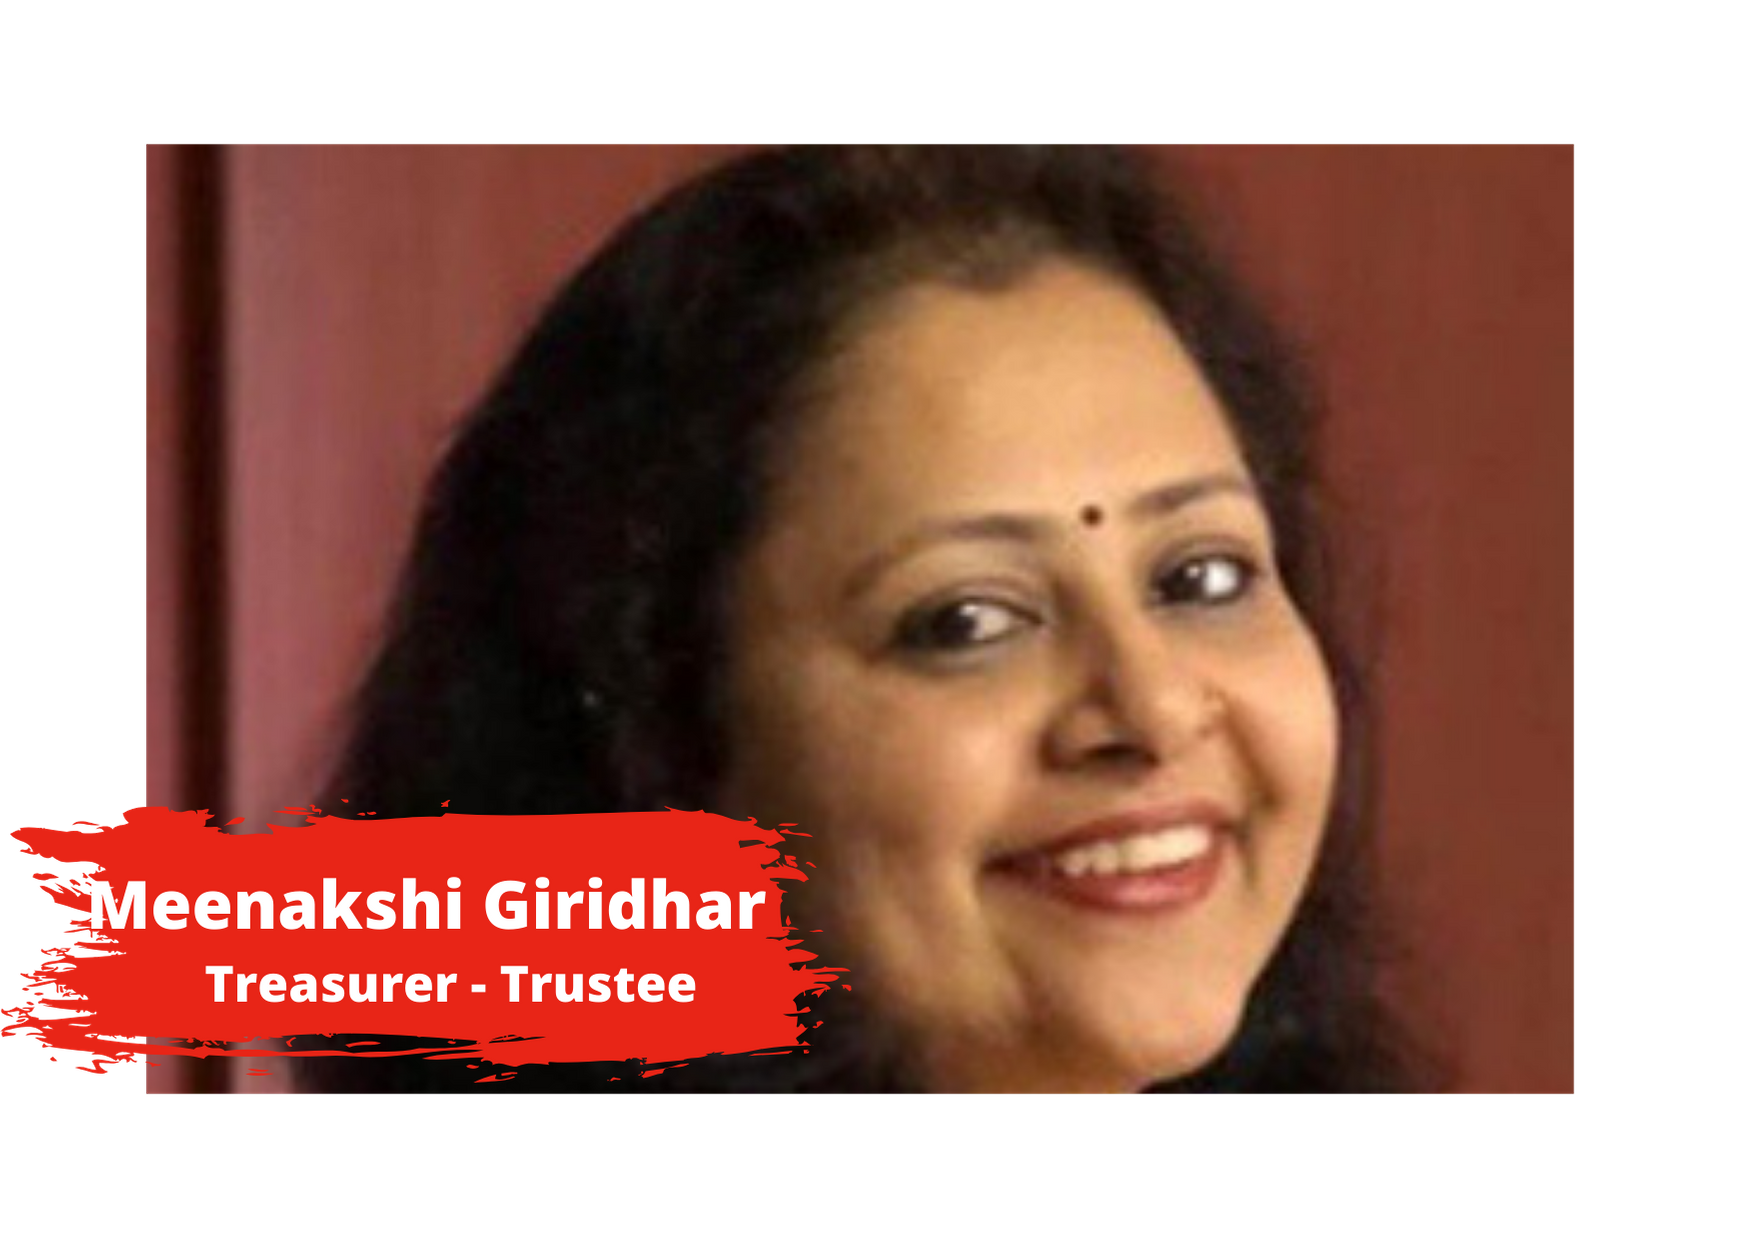 Meenakshi Giridhar